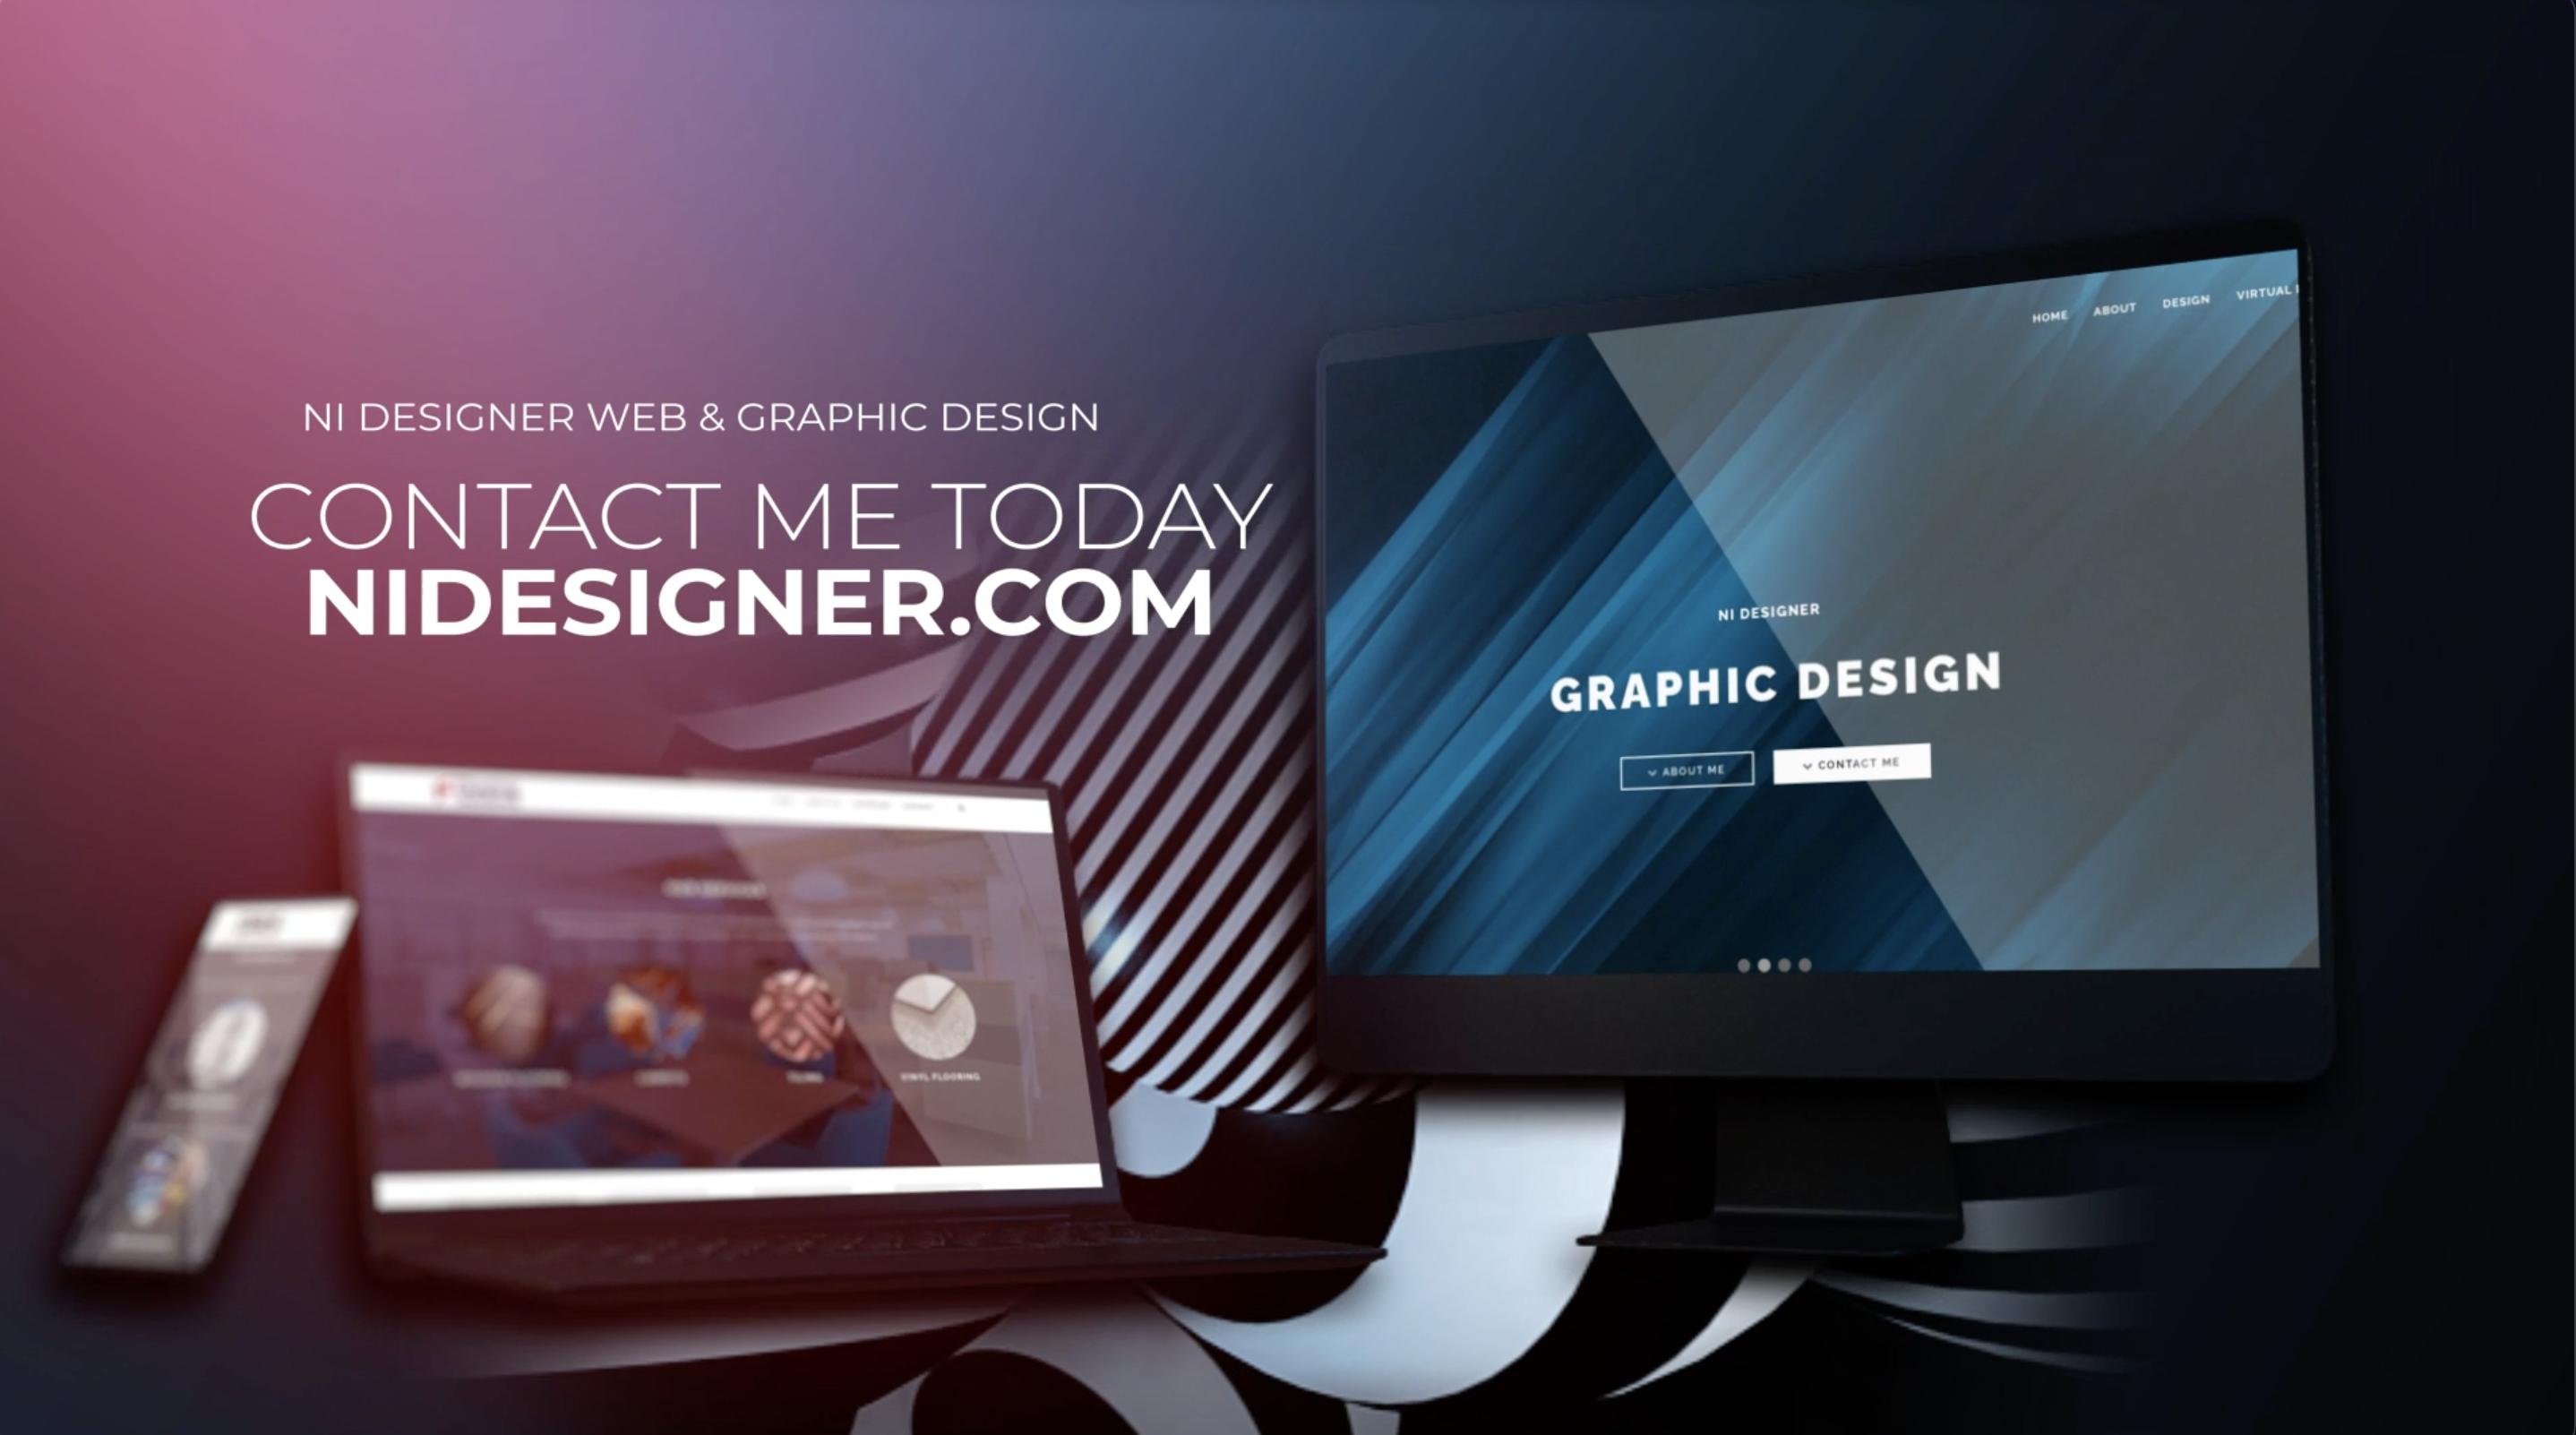 NI Designer web design